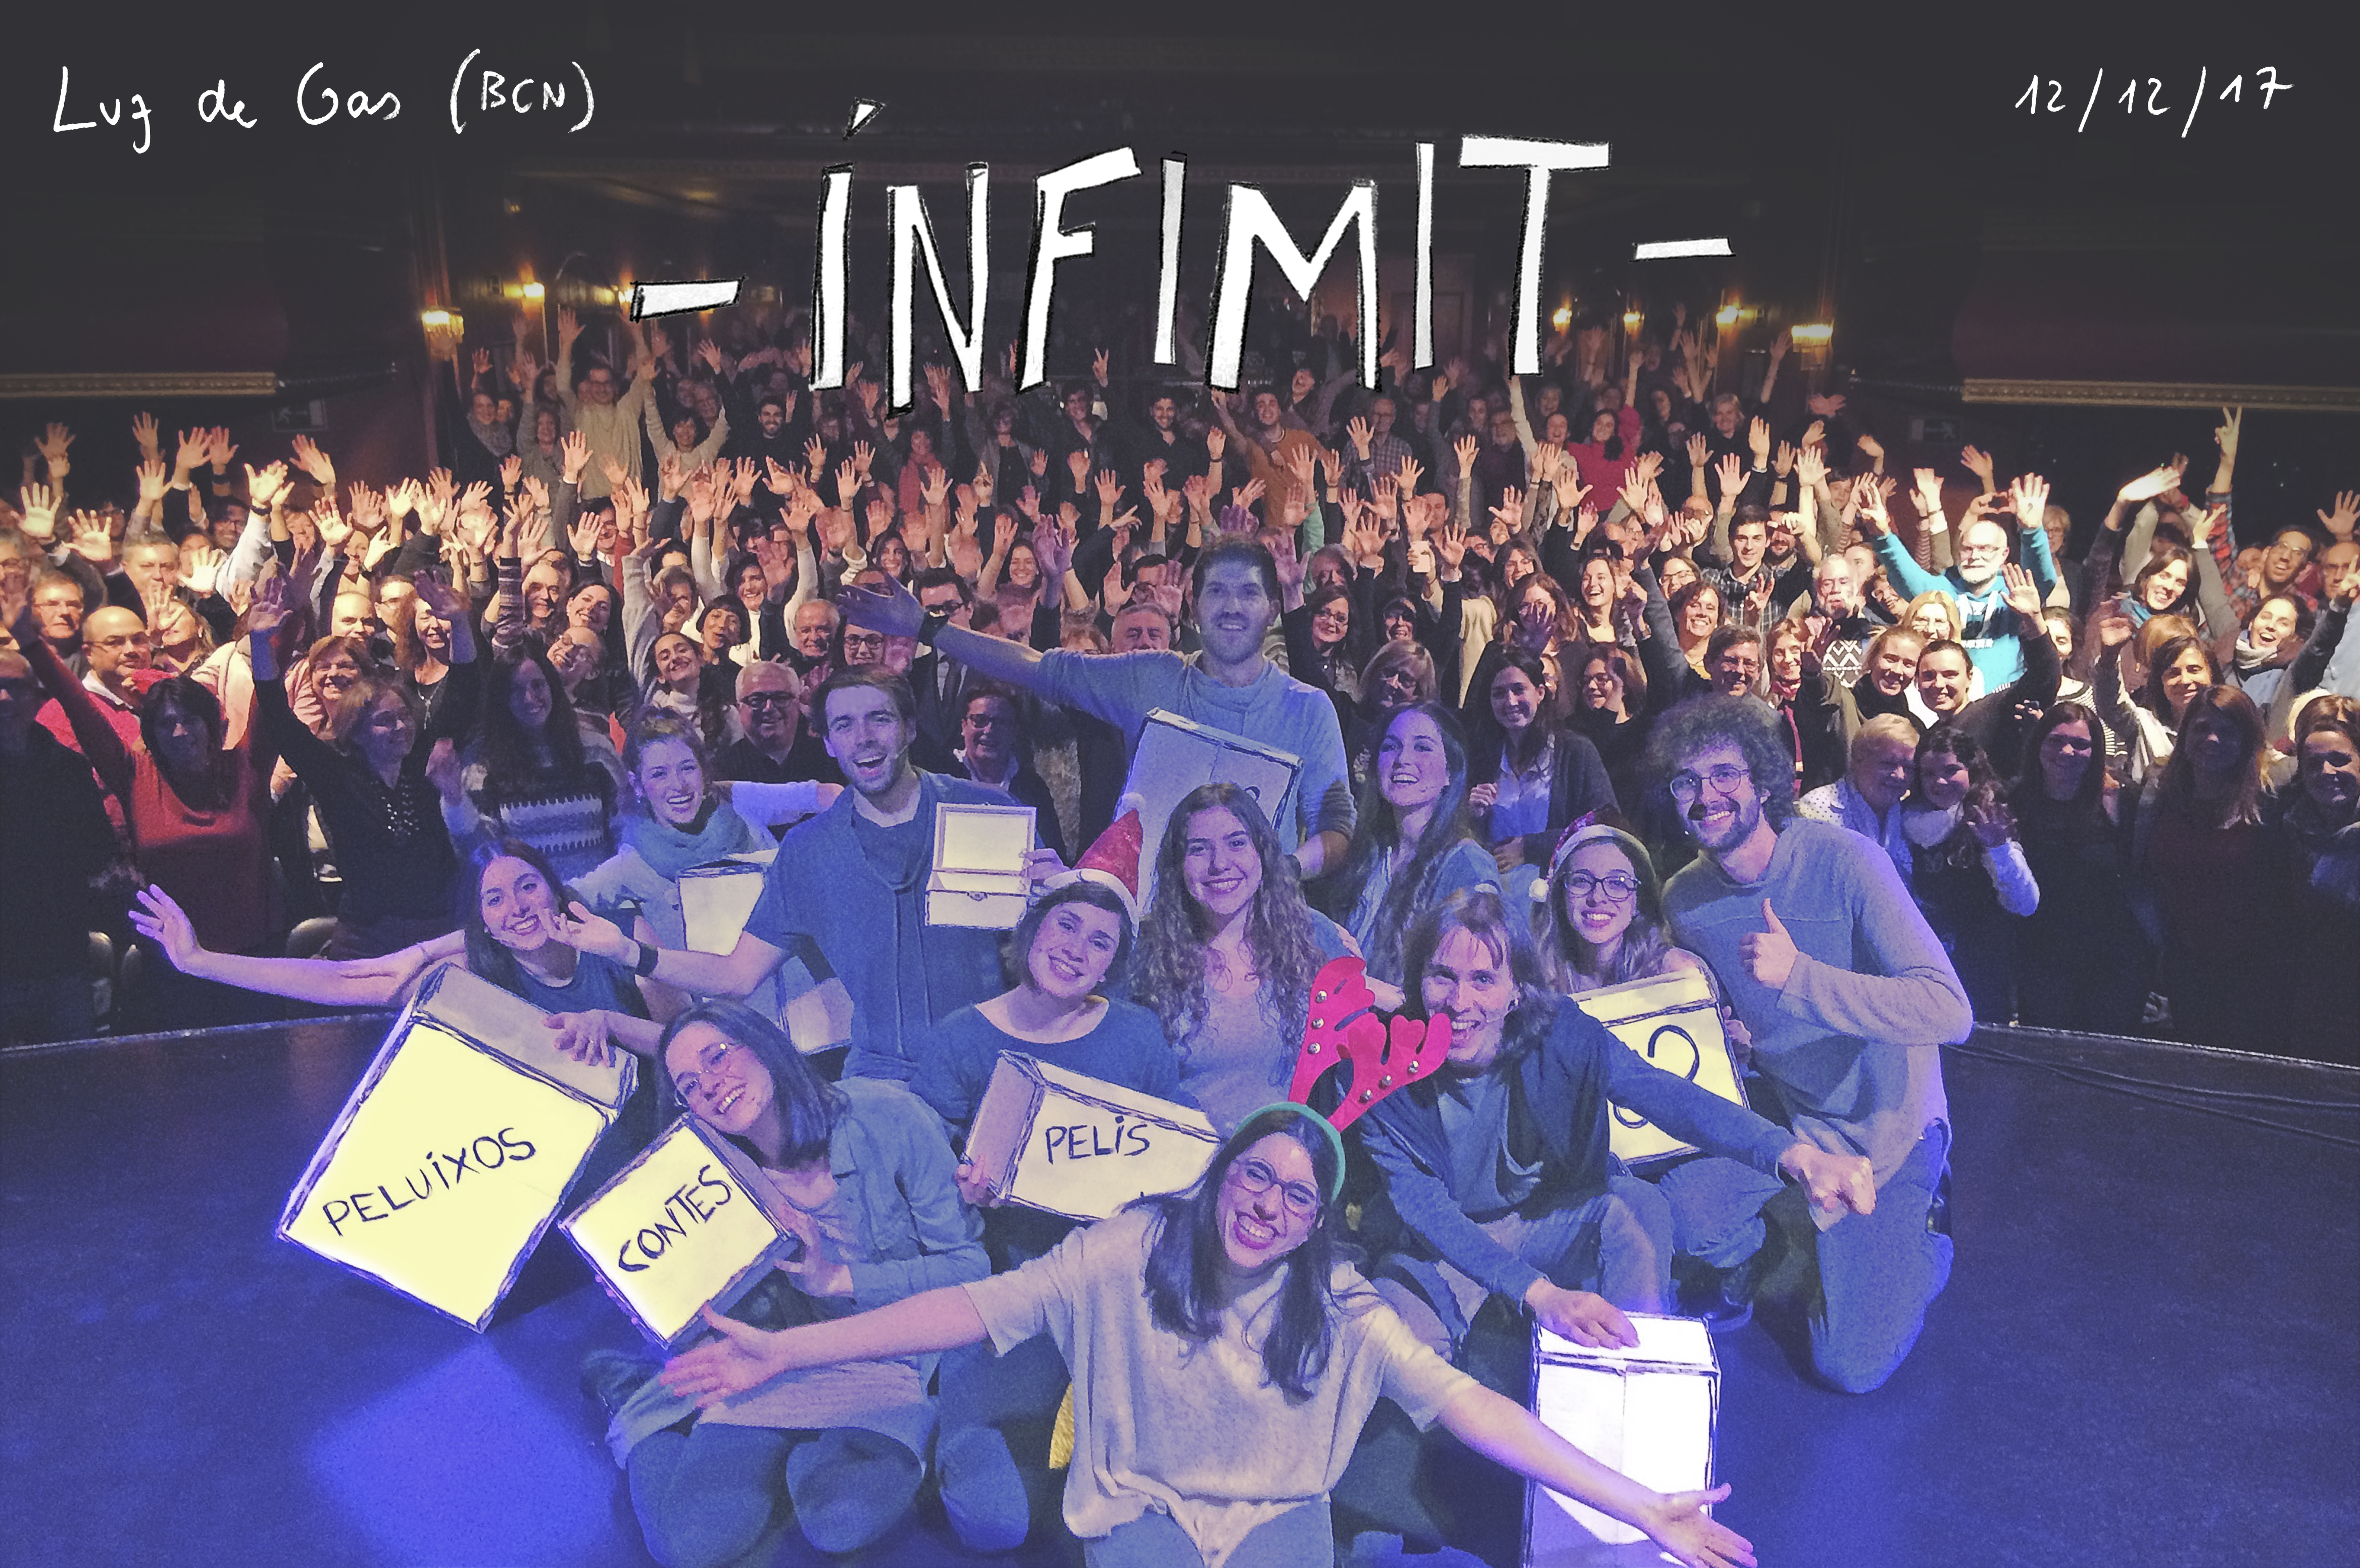 12/12/12 Barcelona